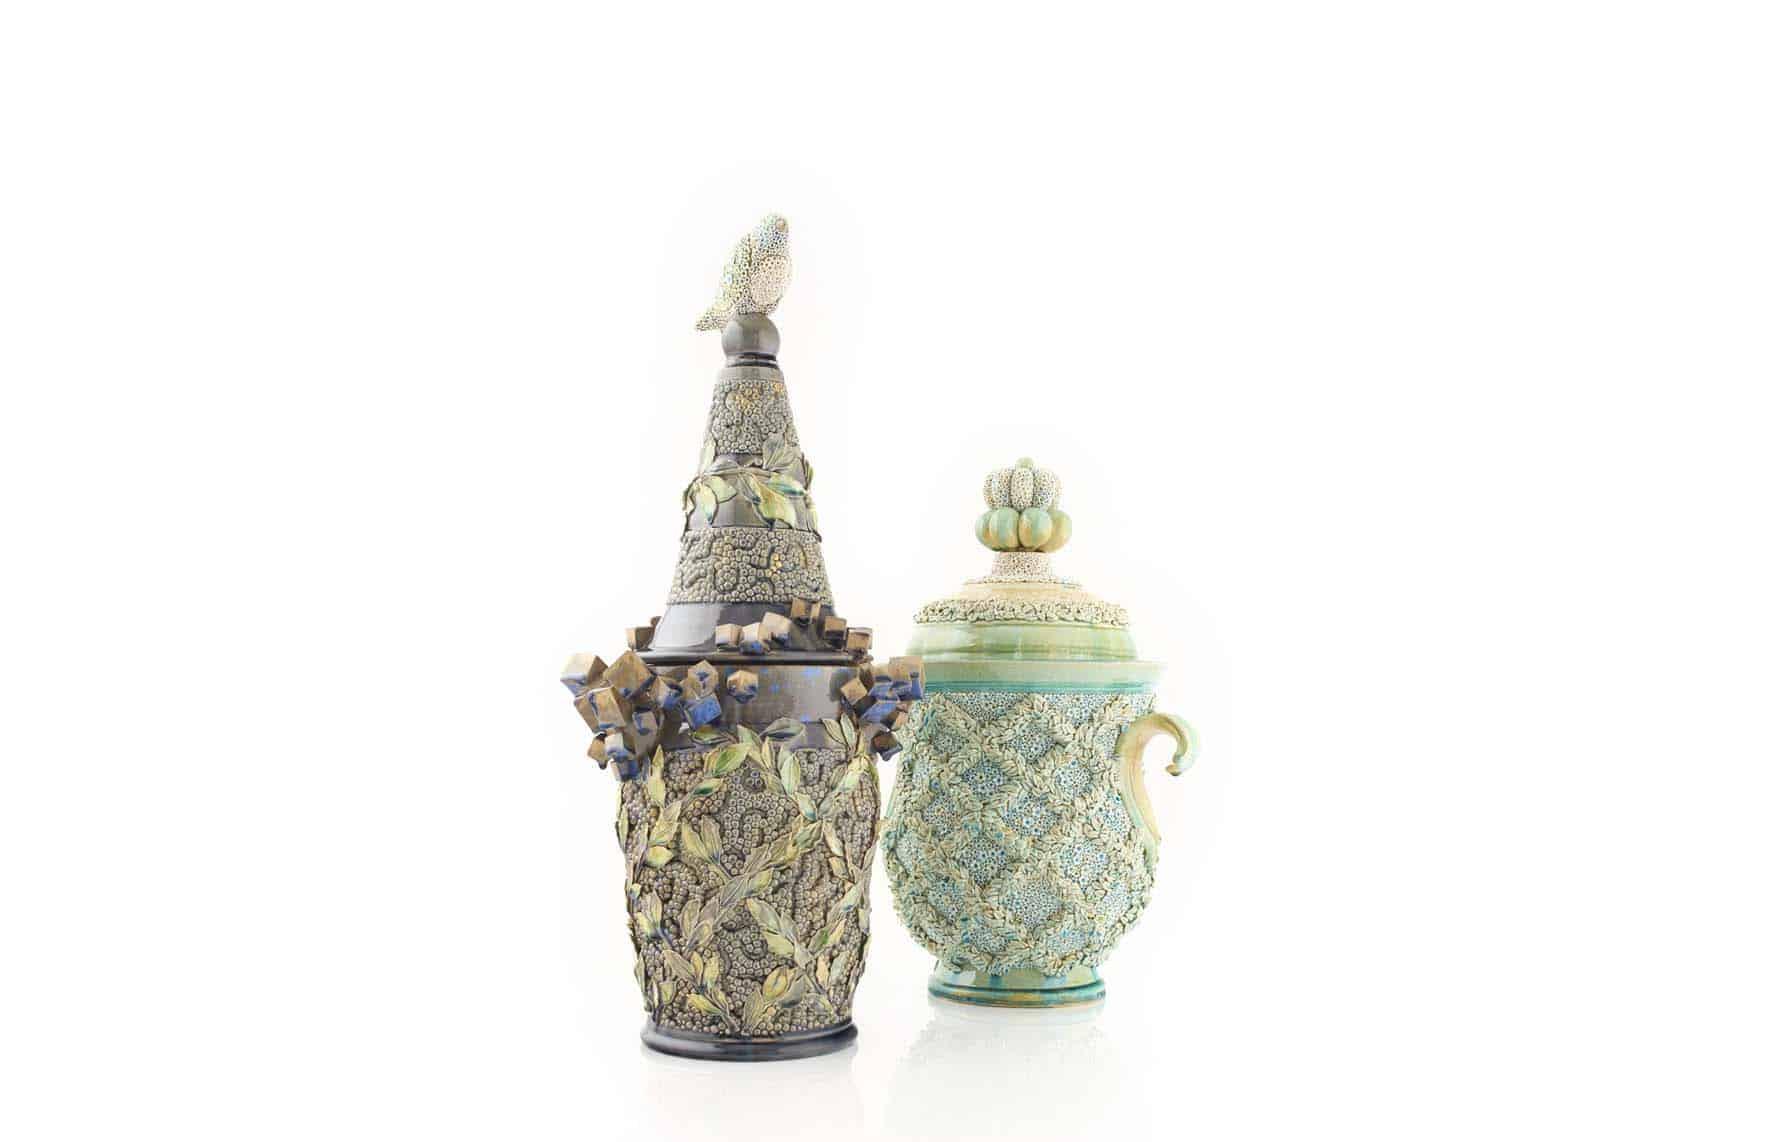 Ceramic sculpture by Kate Malone